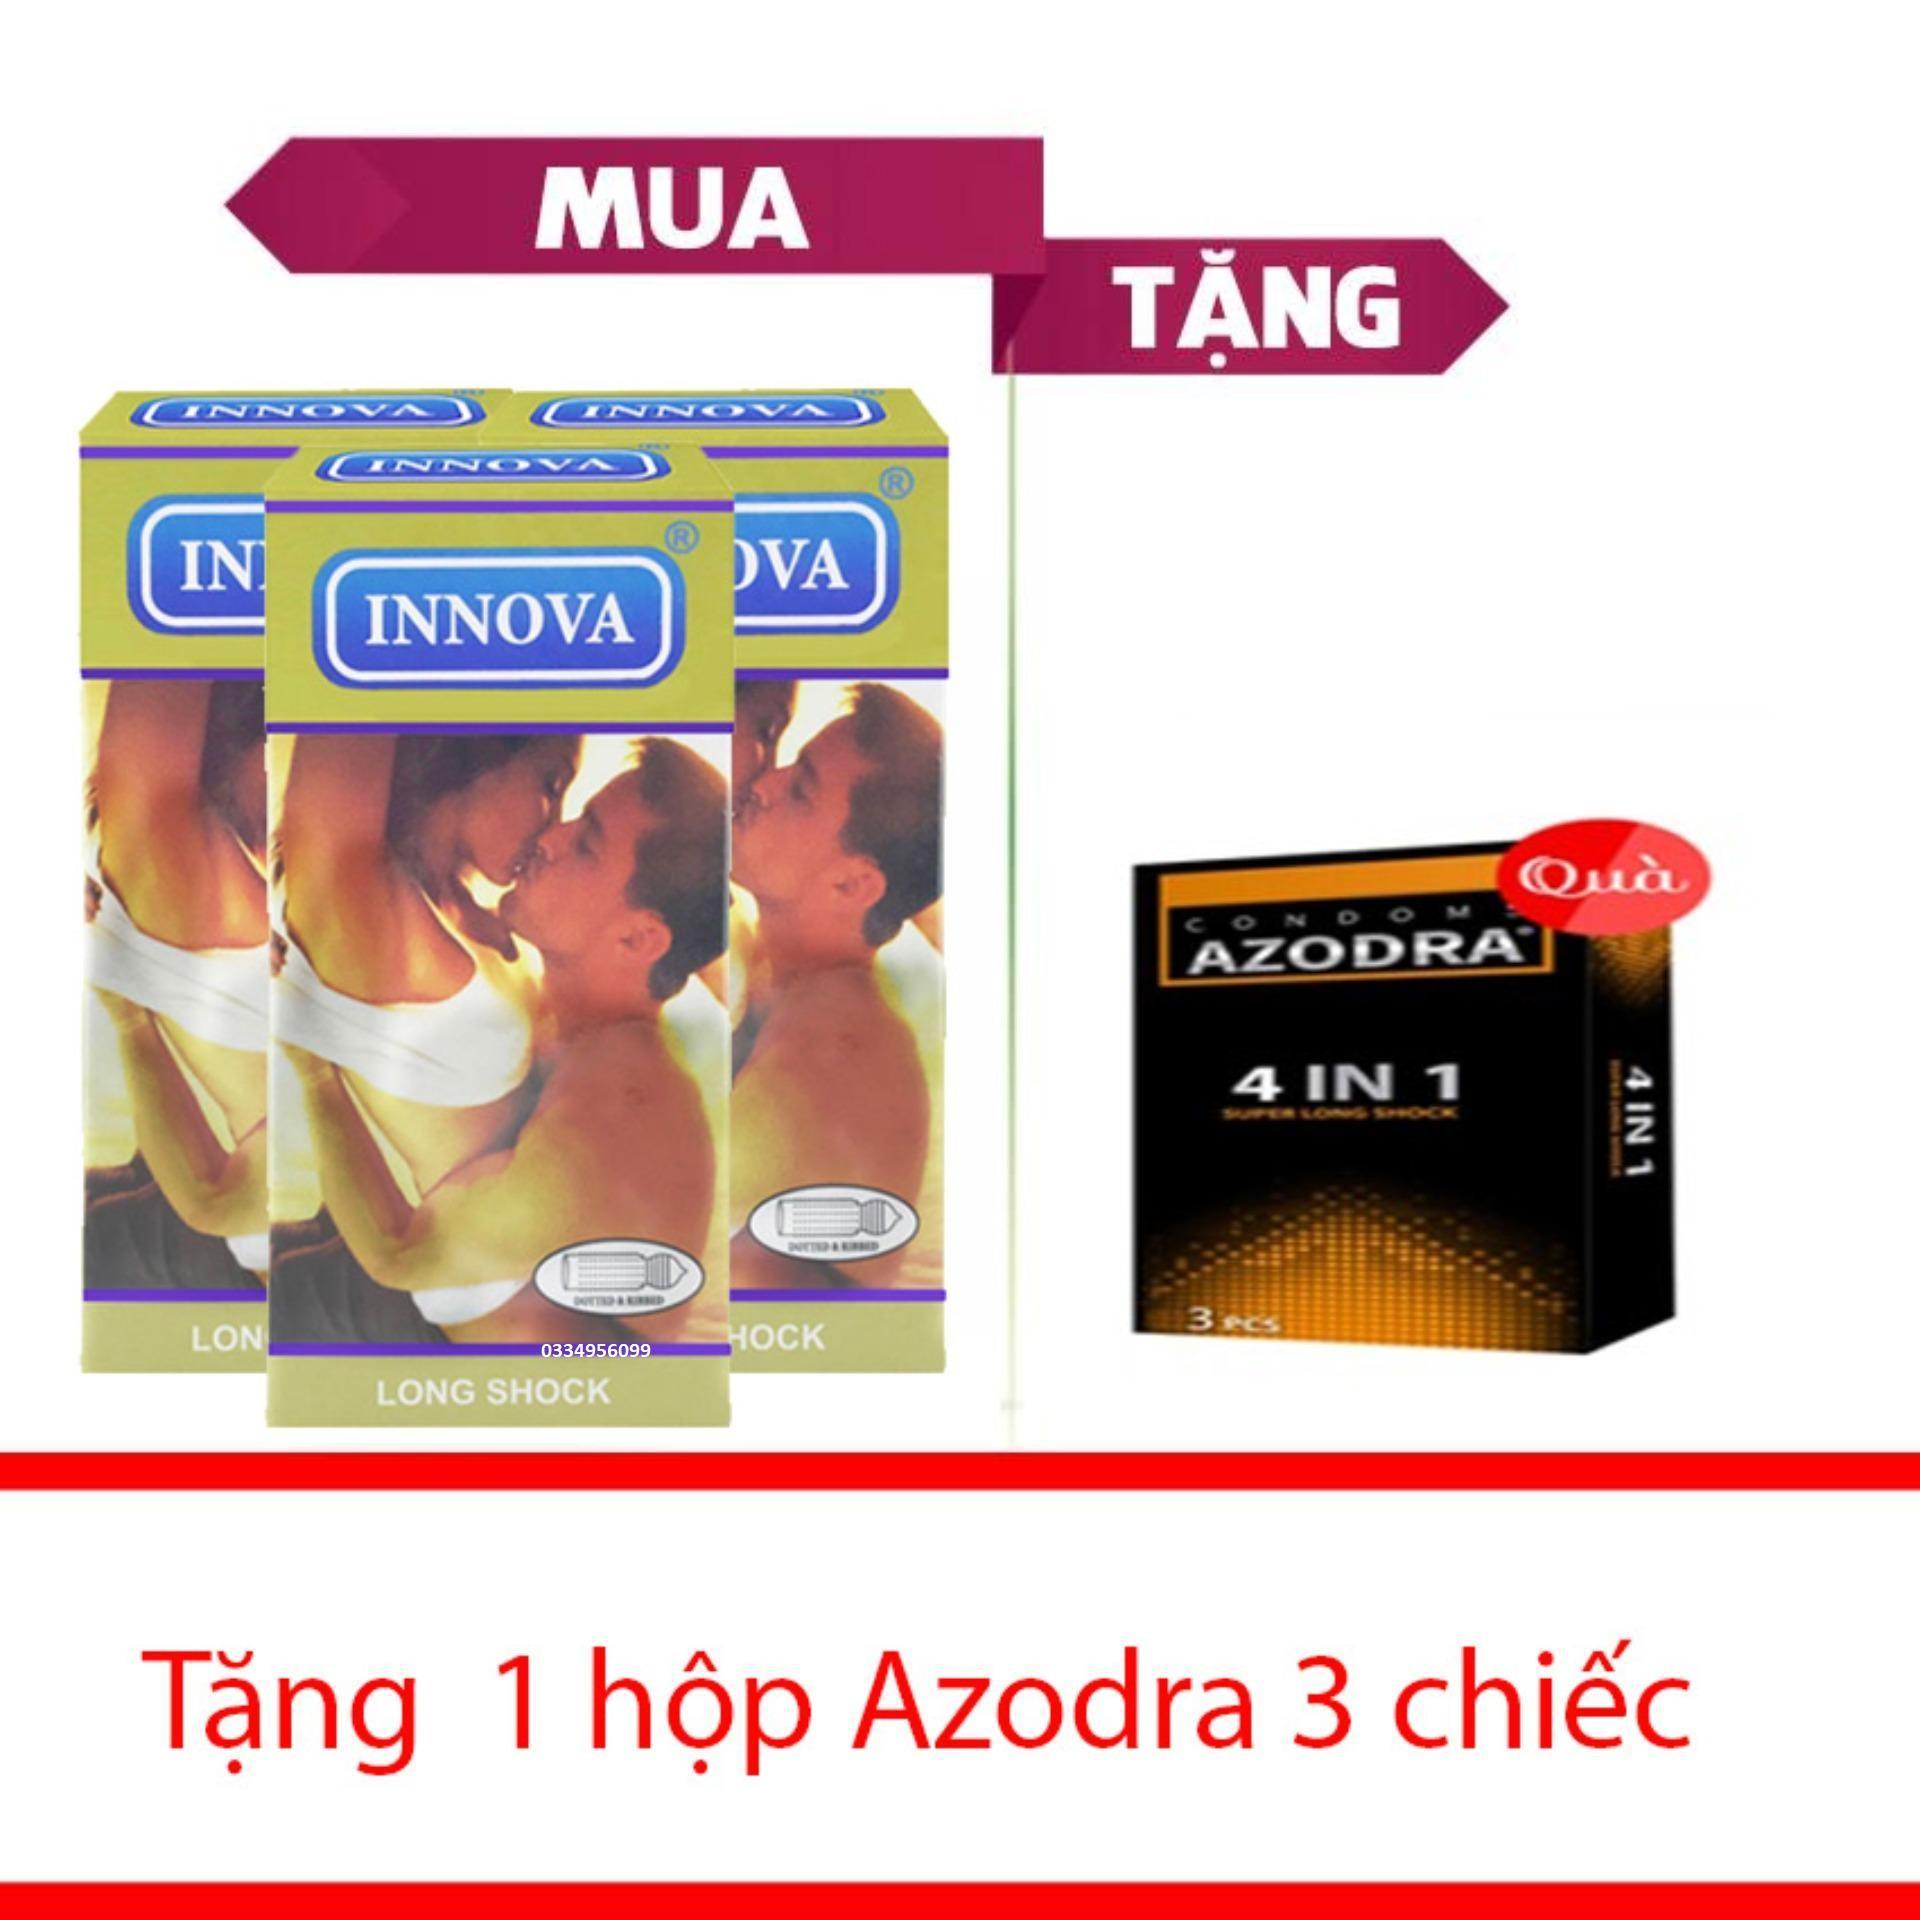 [ Mua 3 Tang 1 ]Combo 3 Hộp Bao cao su INOVA vang gai gân kéo dài thời gian quan hệ.Tang 1 hop bcs azodra gan gai keo dai 3pcs nhập khẩu